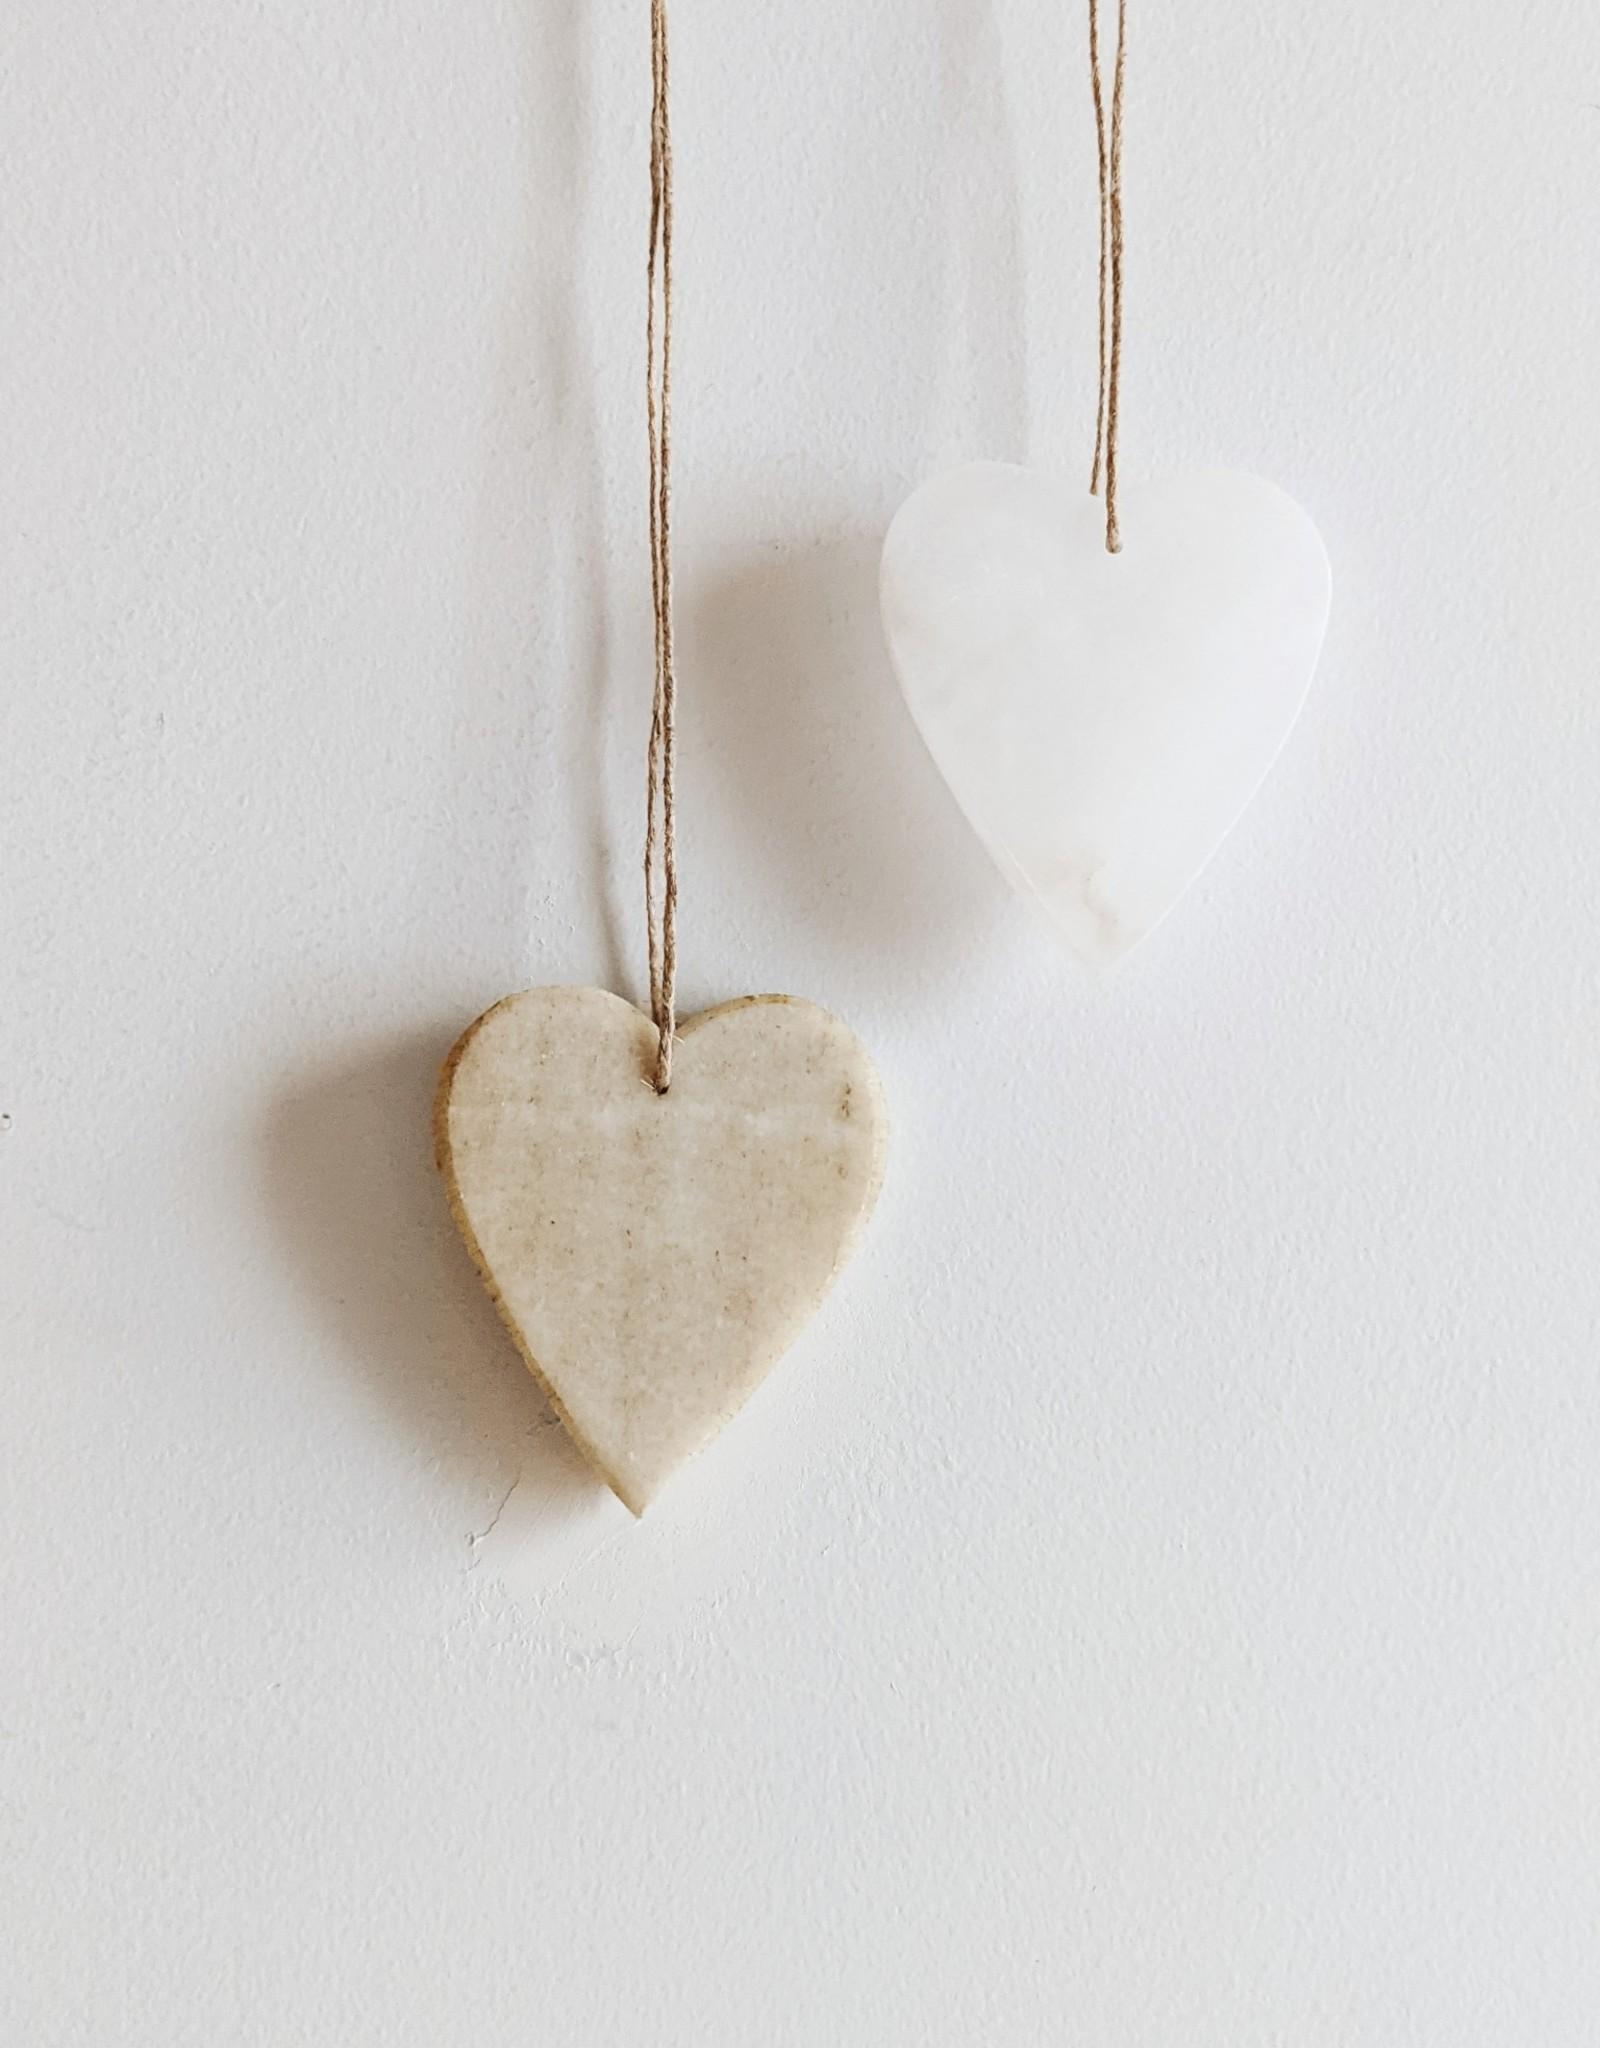 Heart Ornament - Choose the color